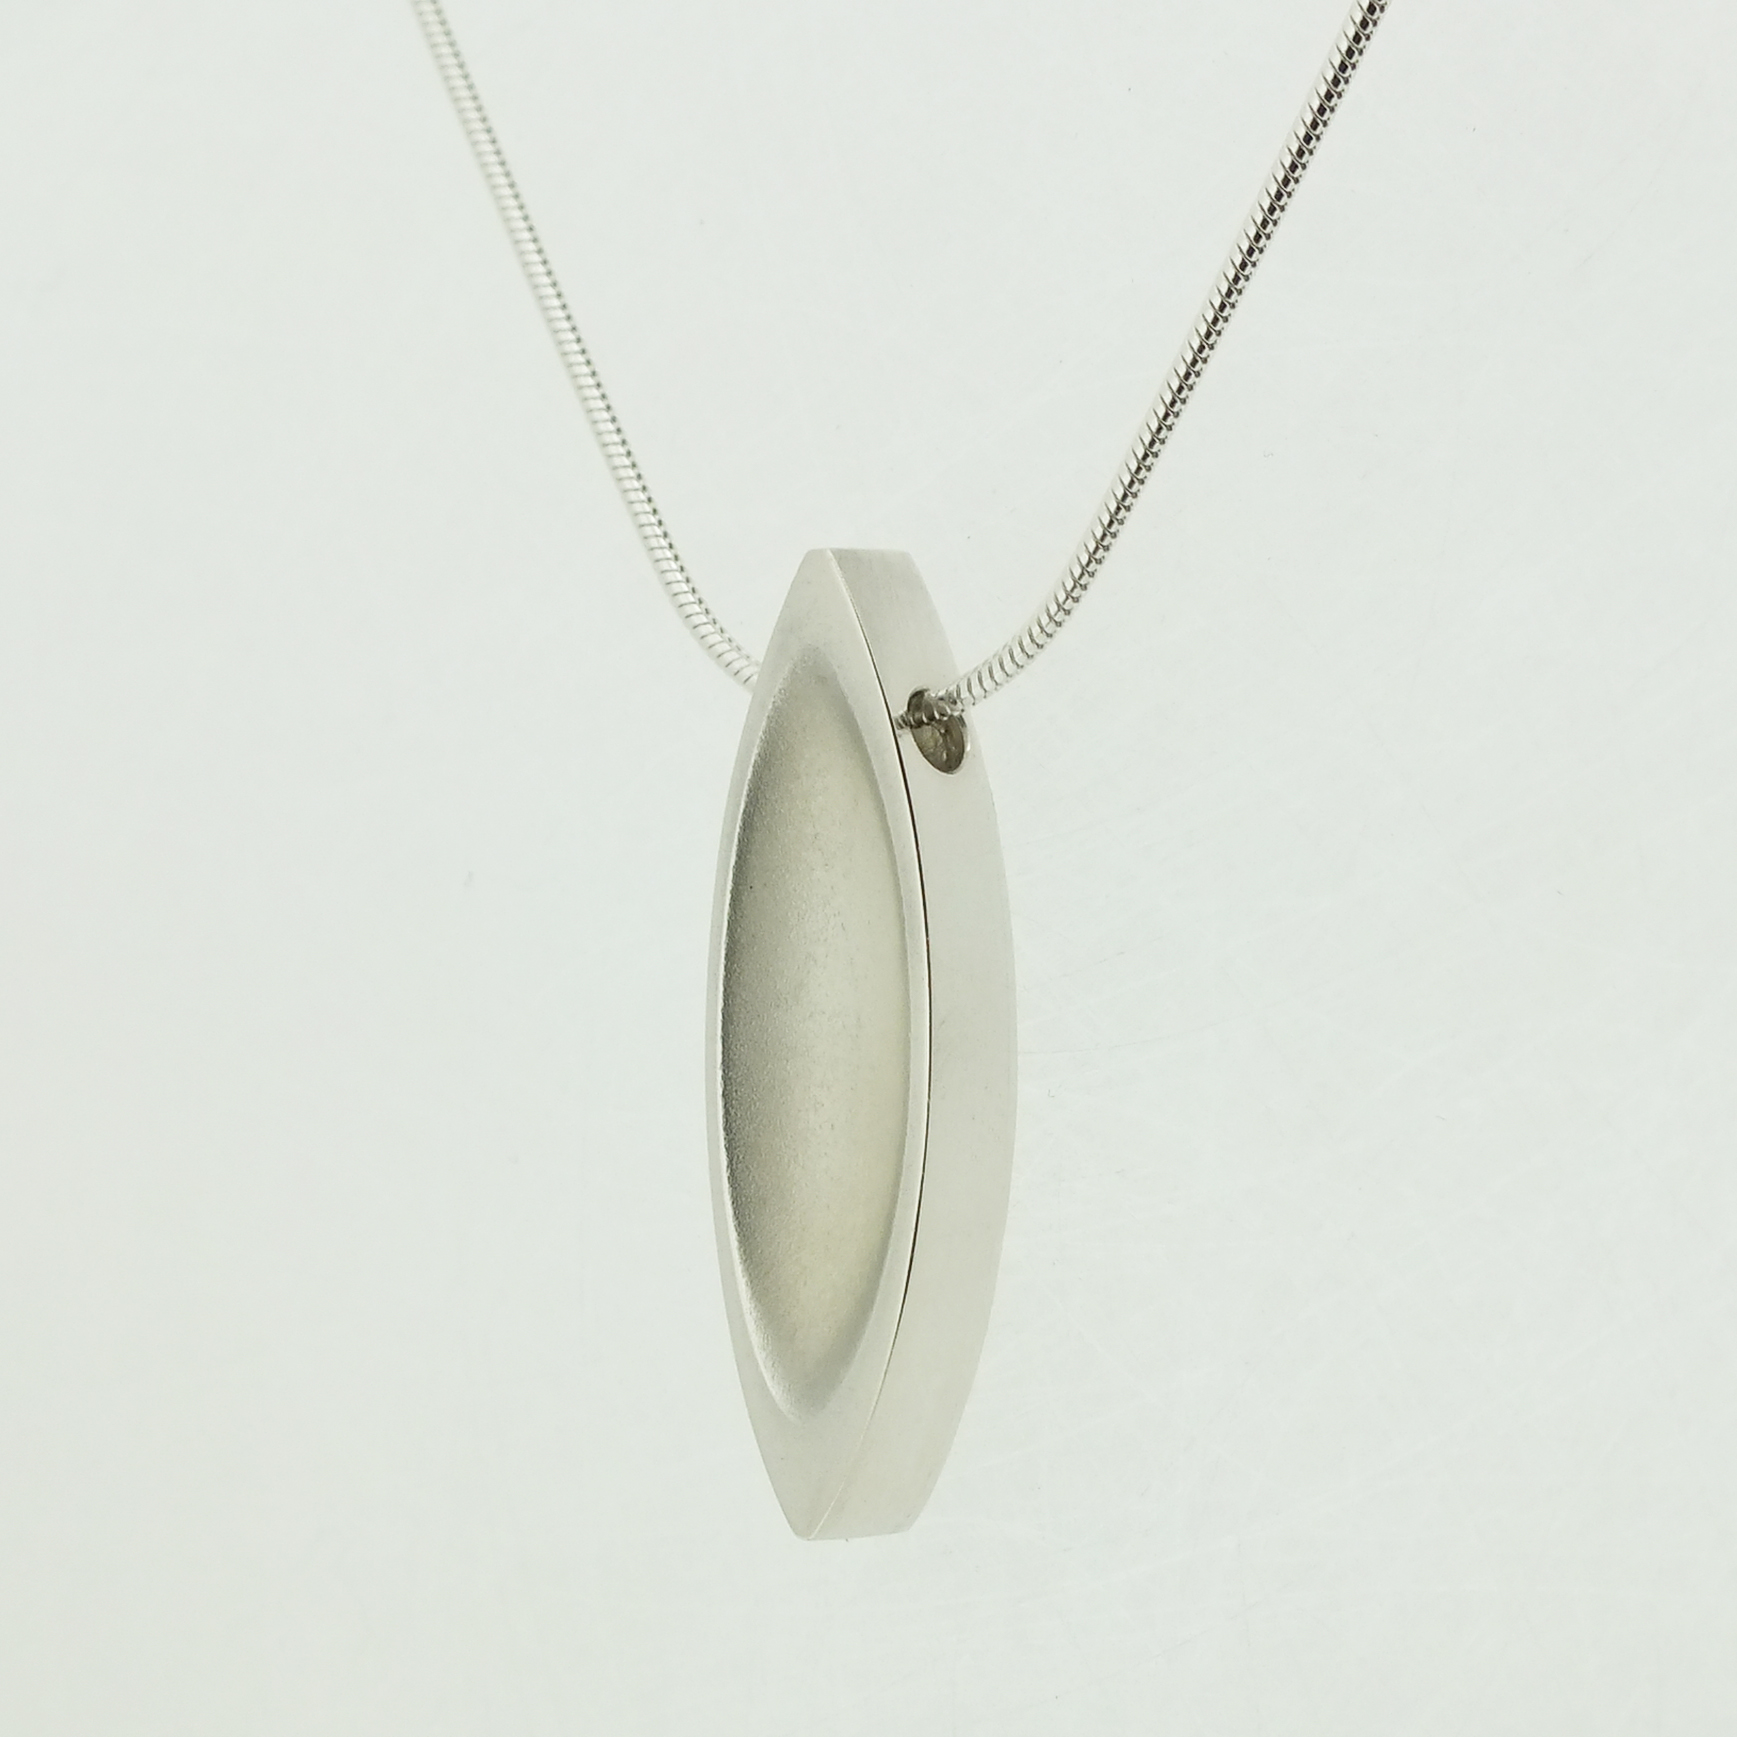 Mandorla Pendant in textured sterling silver